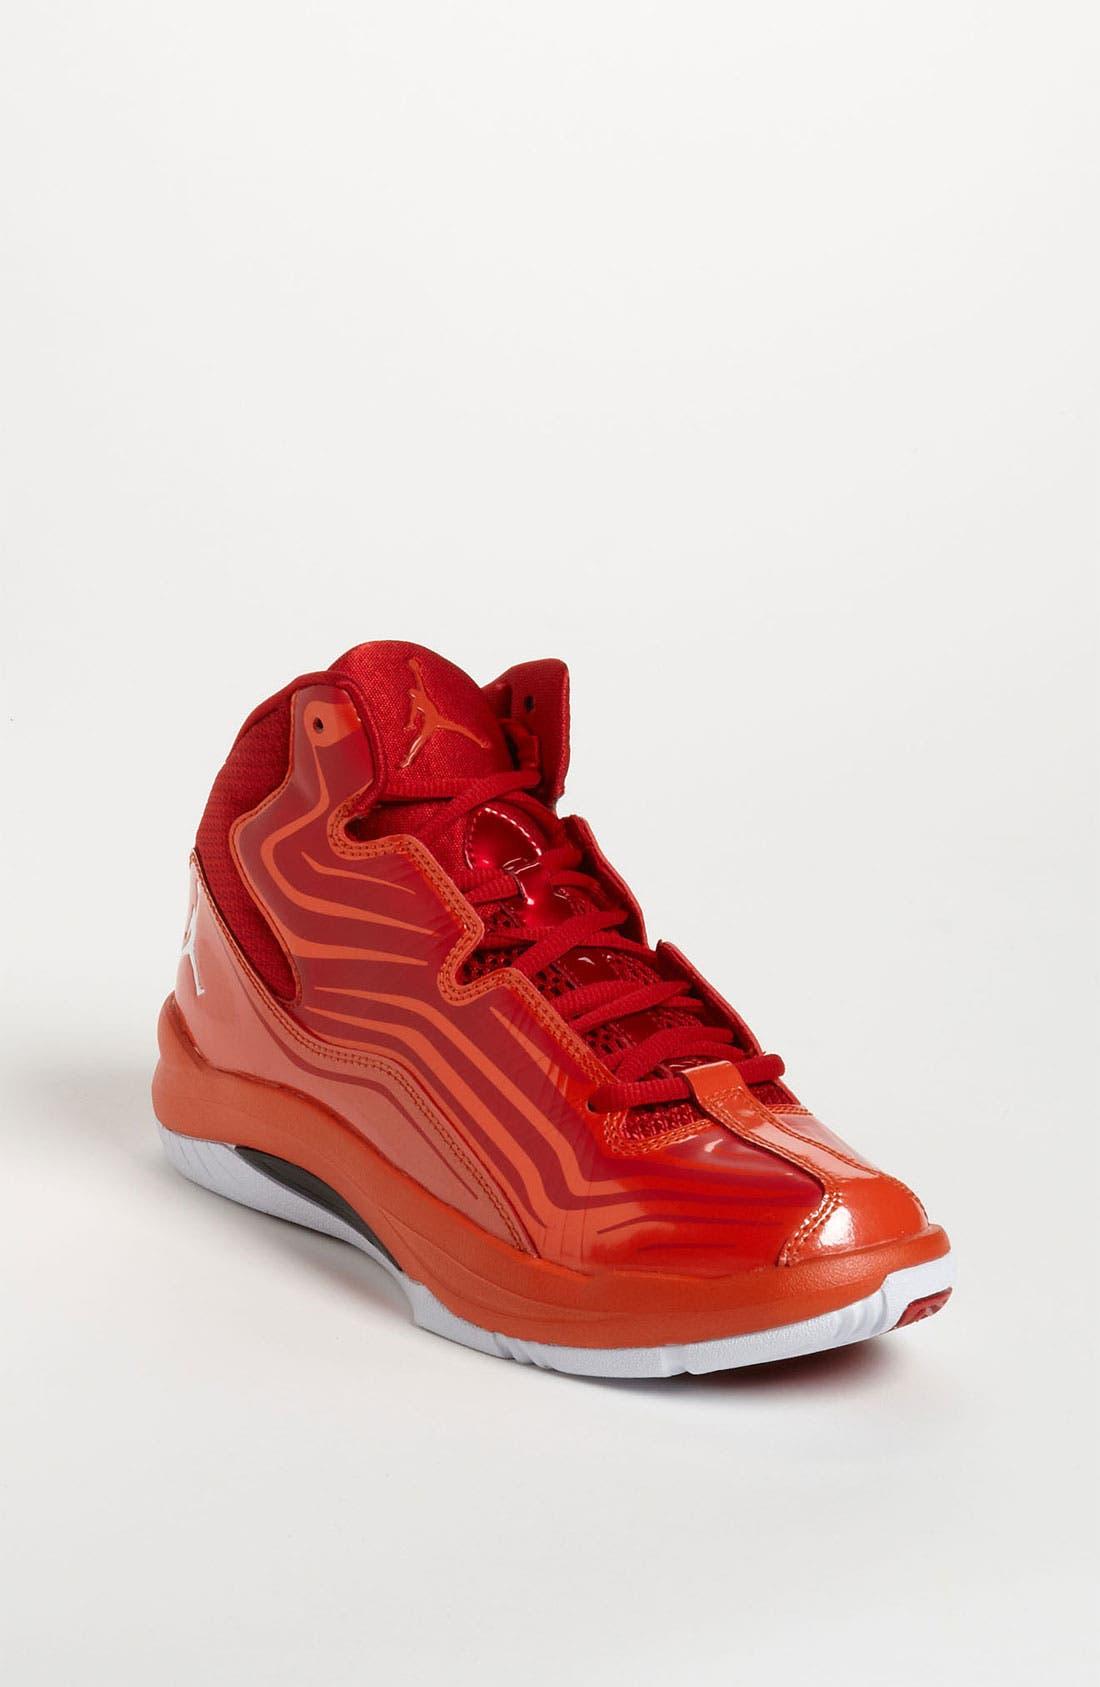 Main Image - Nike 'Jordan Aero Mania' Sneaker (Big Kid)